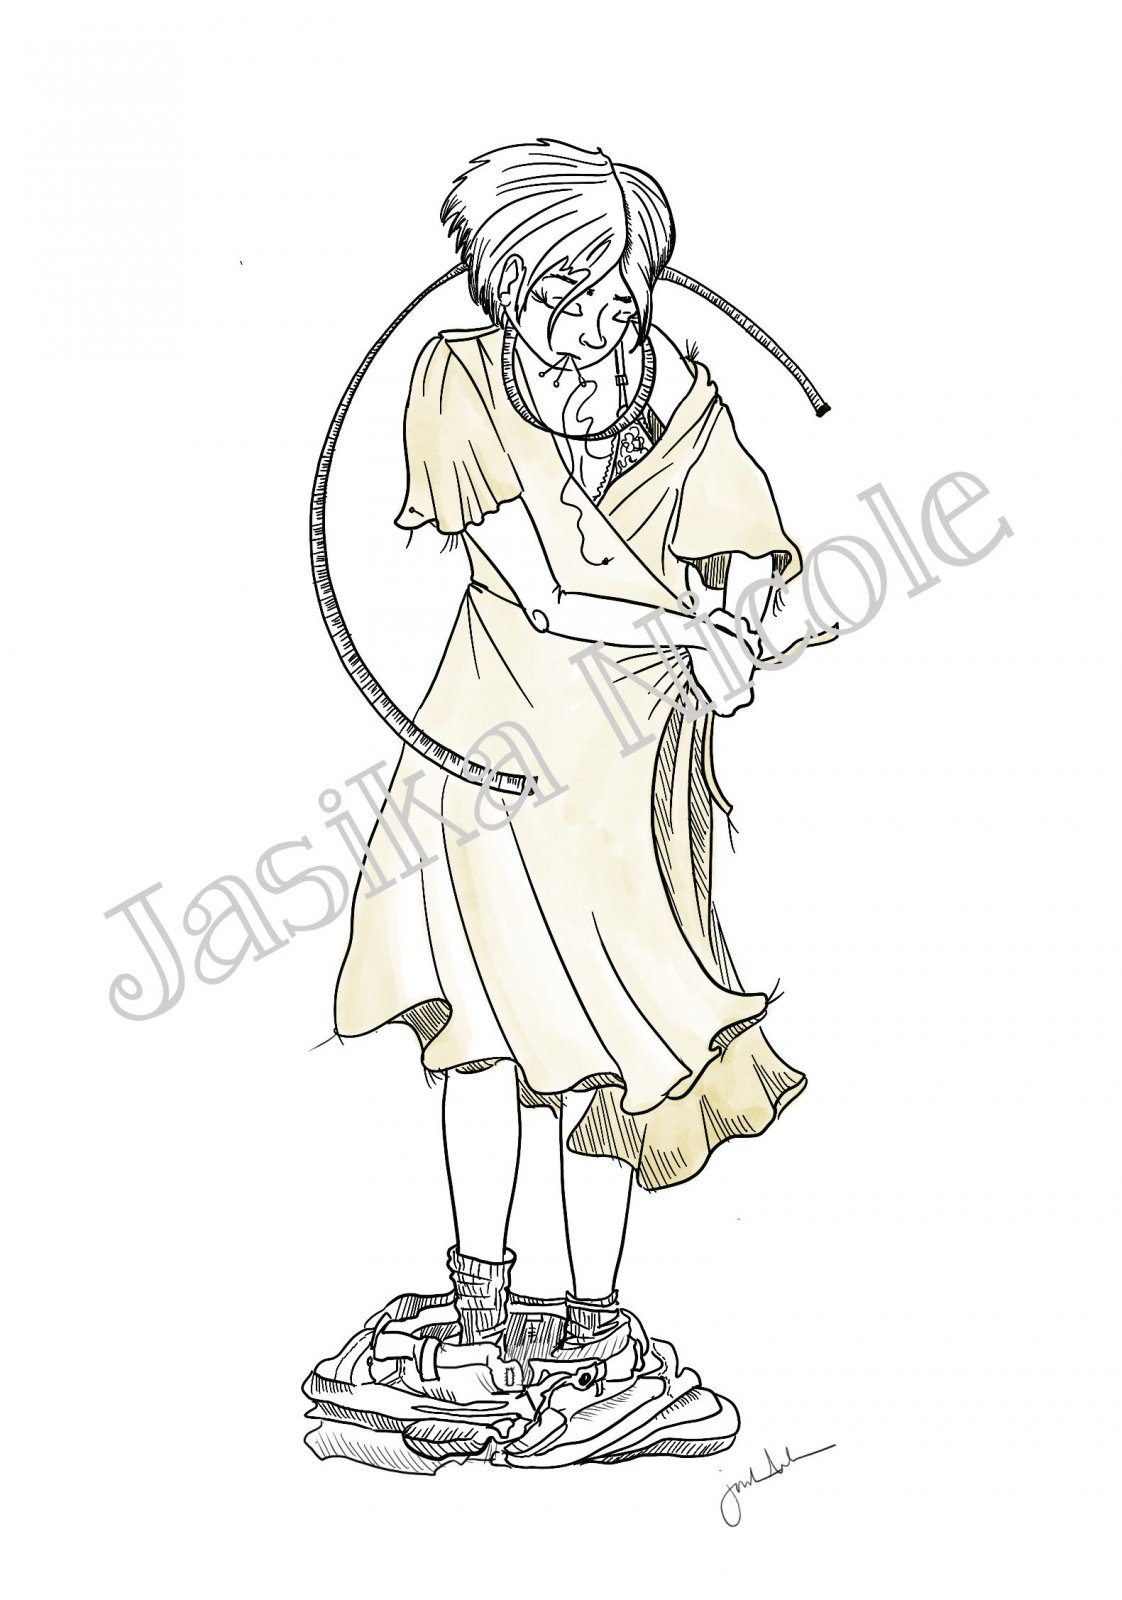 Sew Close Illustration by Jasika Nicole; 11x17